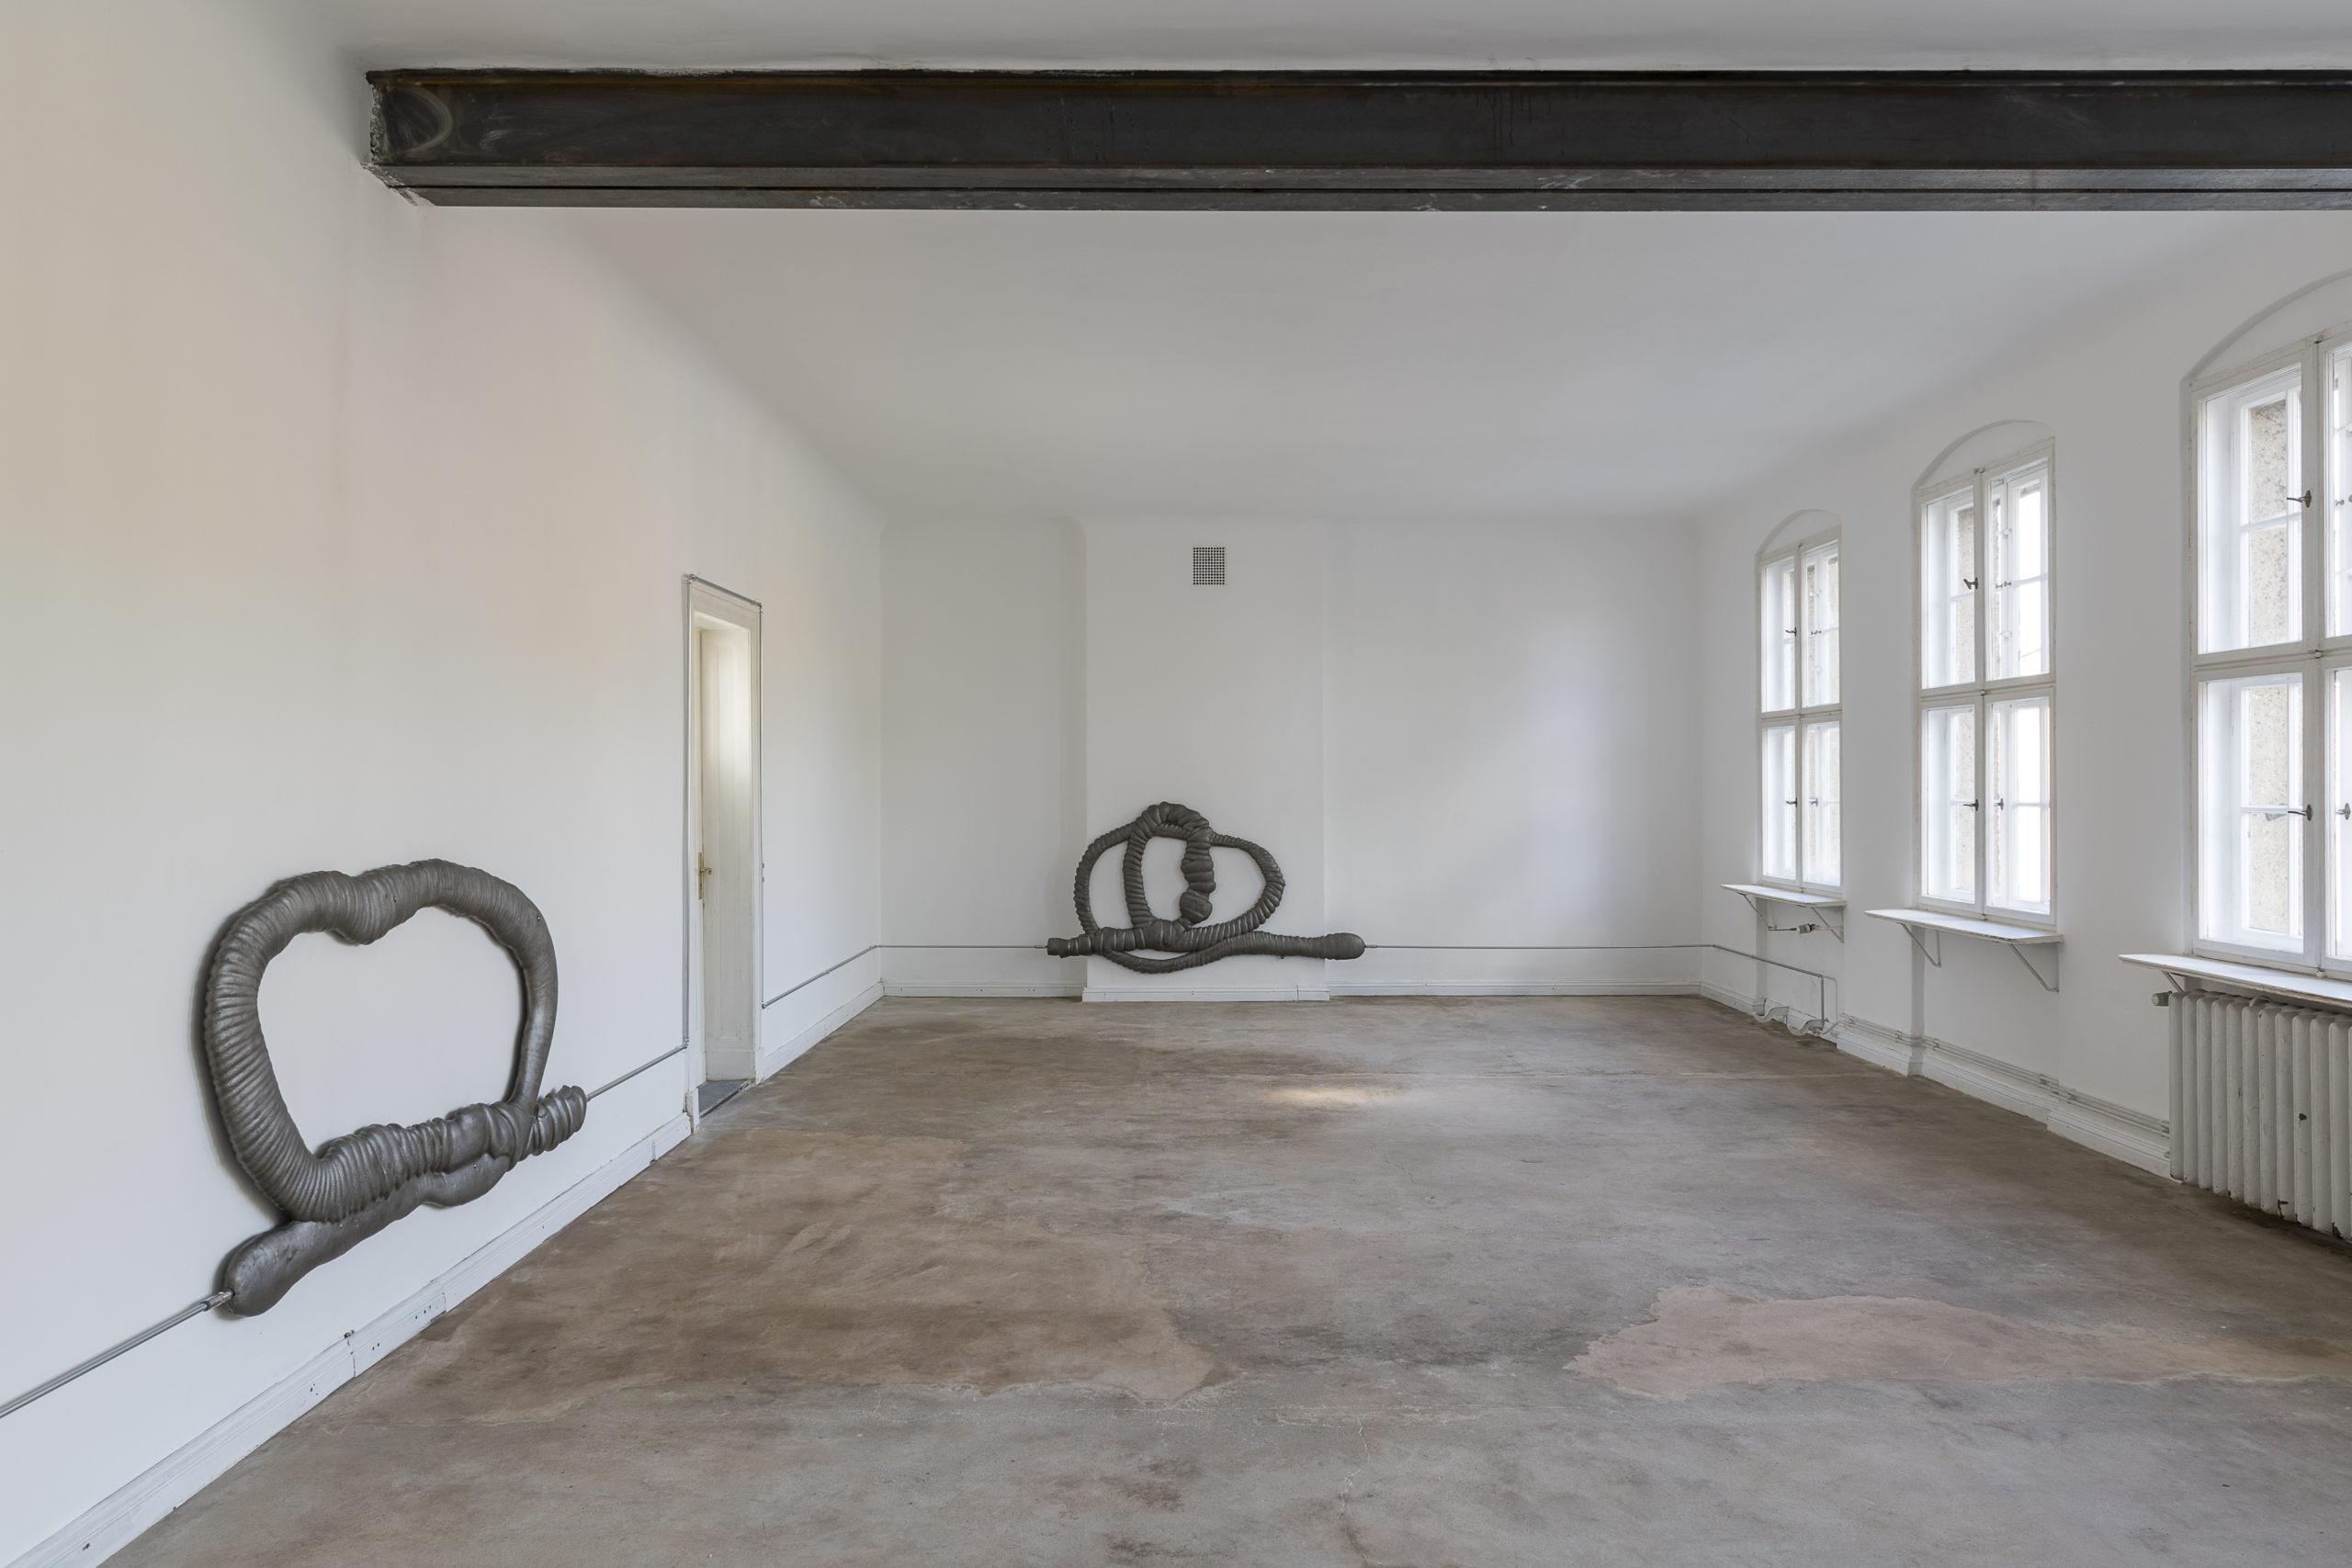 Interview with E-Werk: Art as power